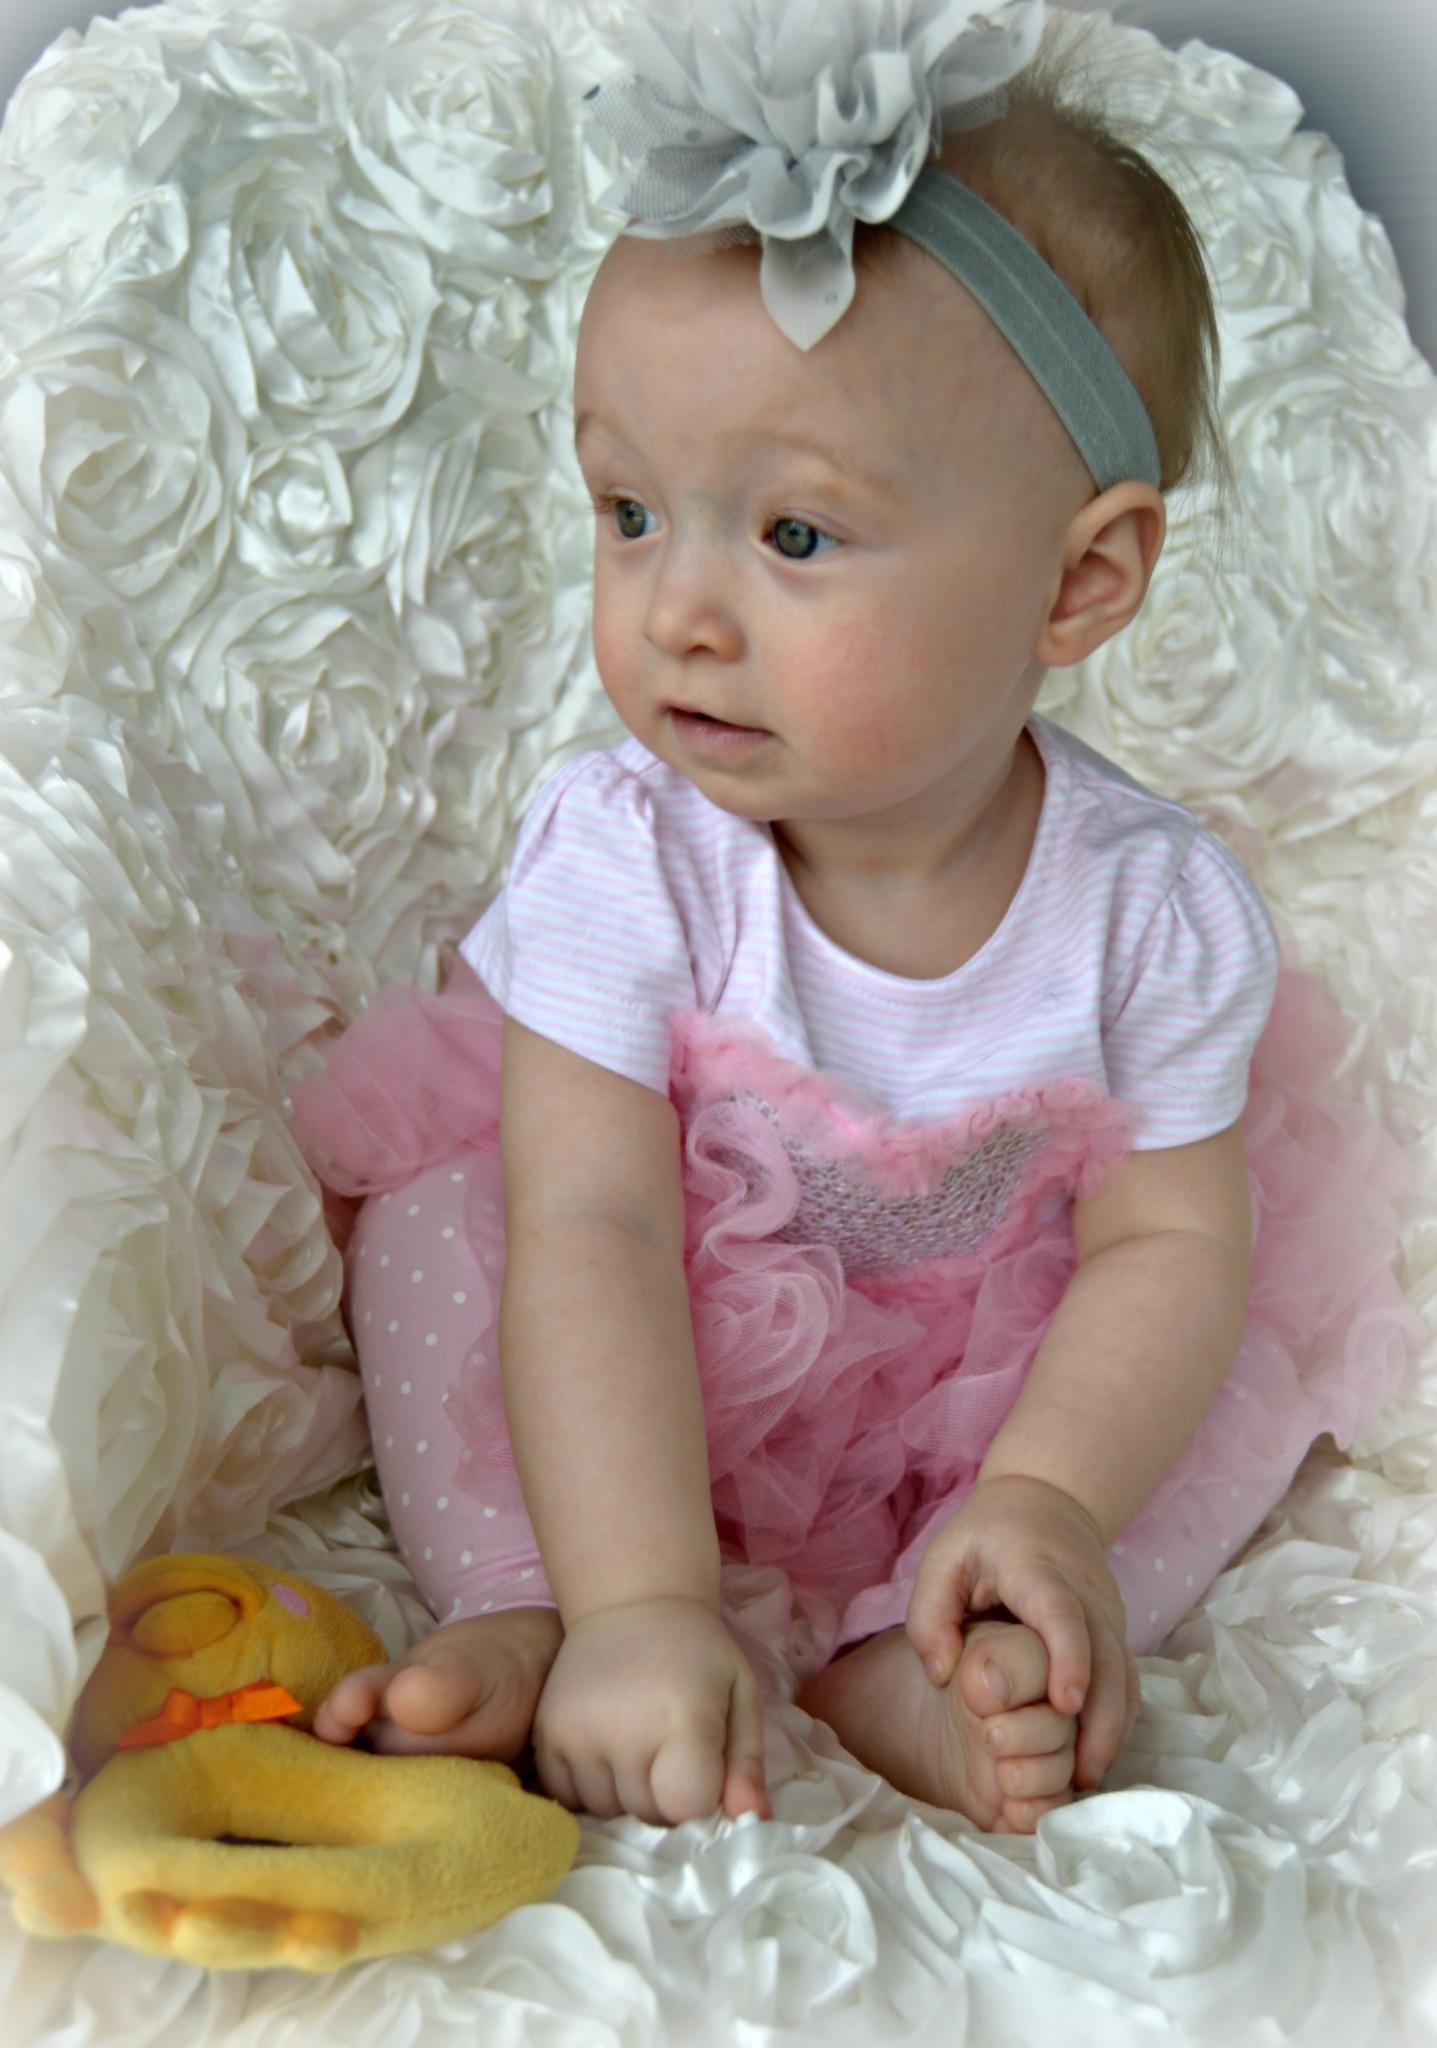 Little Princess by sandy.brown.756